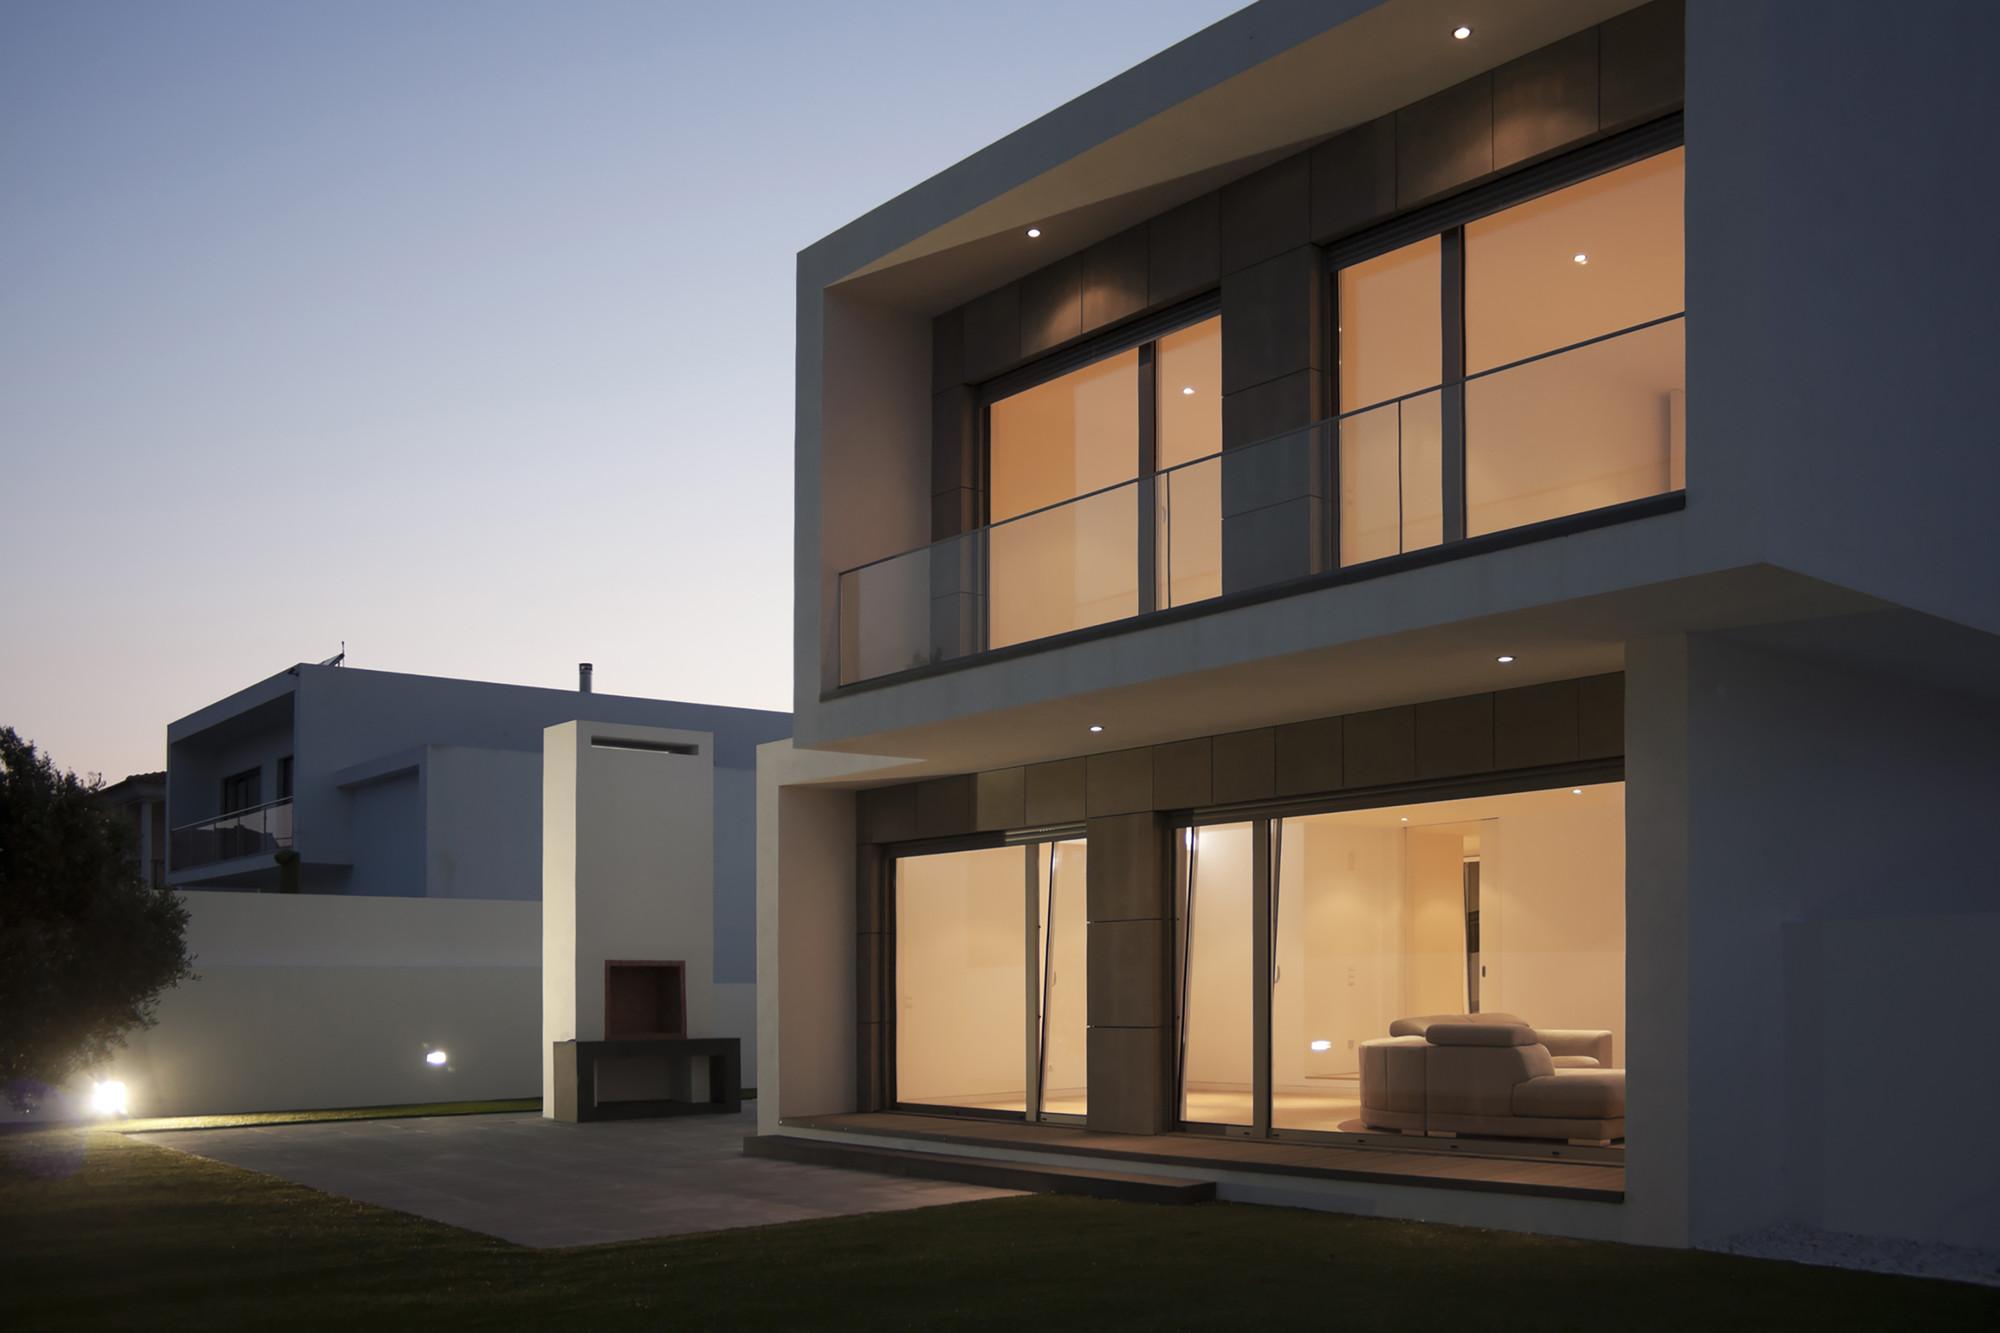 Galeria de casa paulo rolo inspazo arquitectura 15 for Casa moderna 99 arena